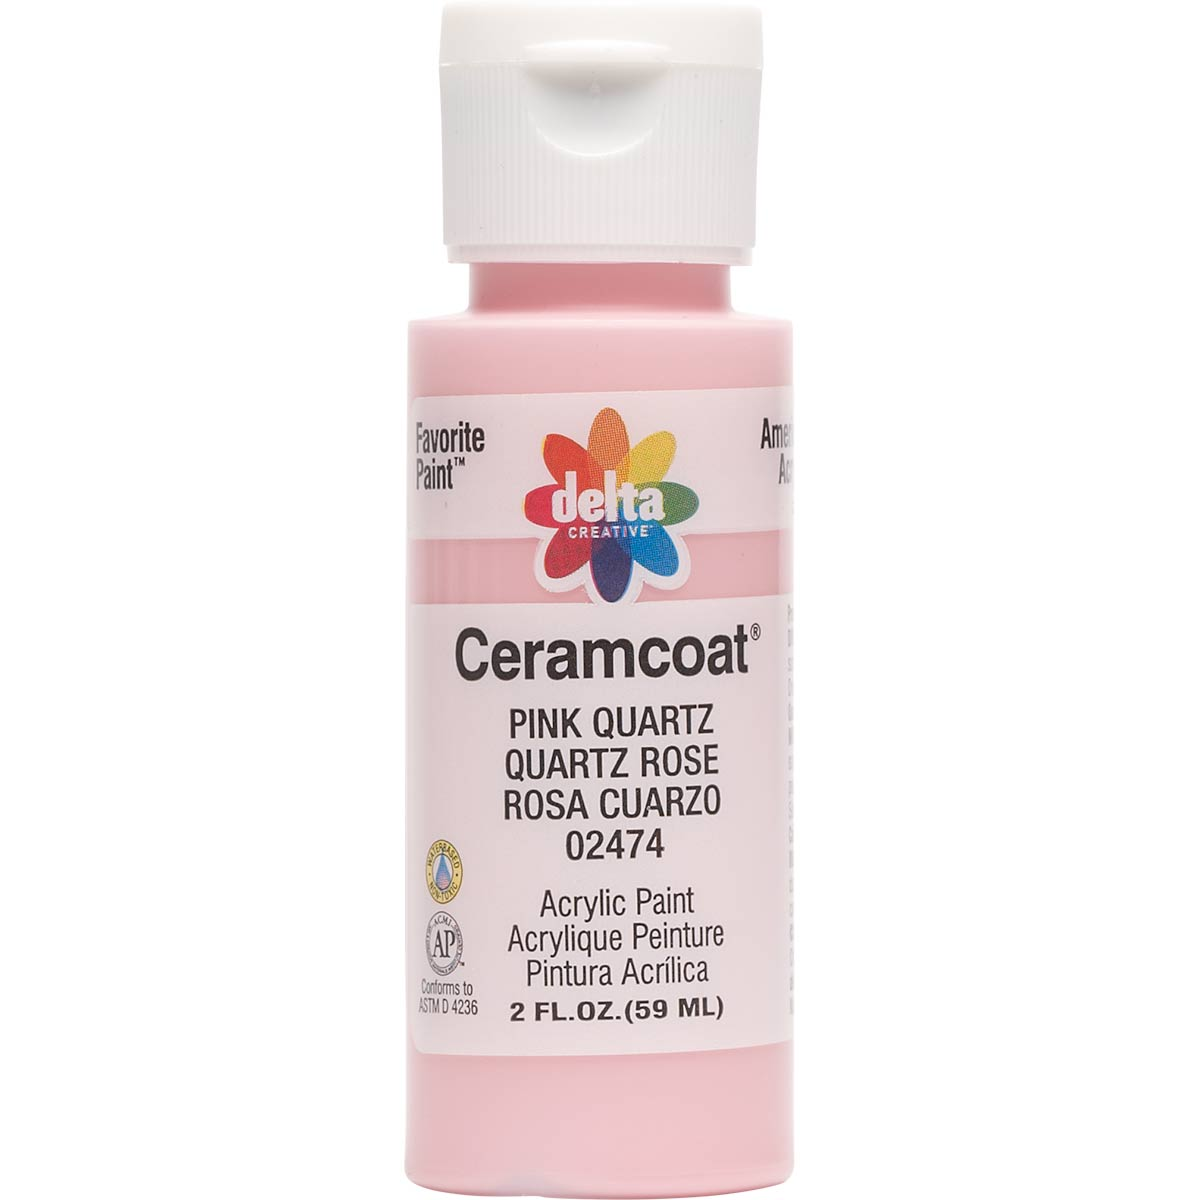 Delta Ceramcoat ® Acrylic Paint - Pink Quartz, 2 oz. - 024740202W